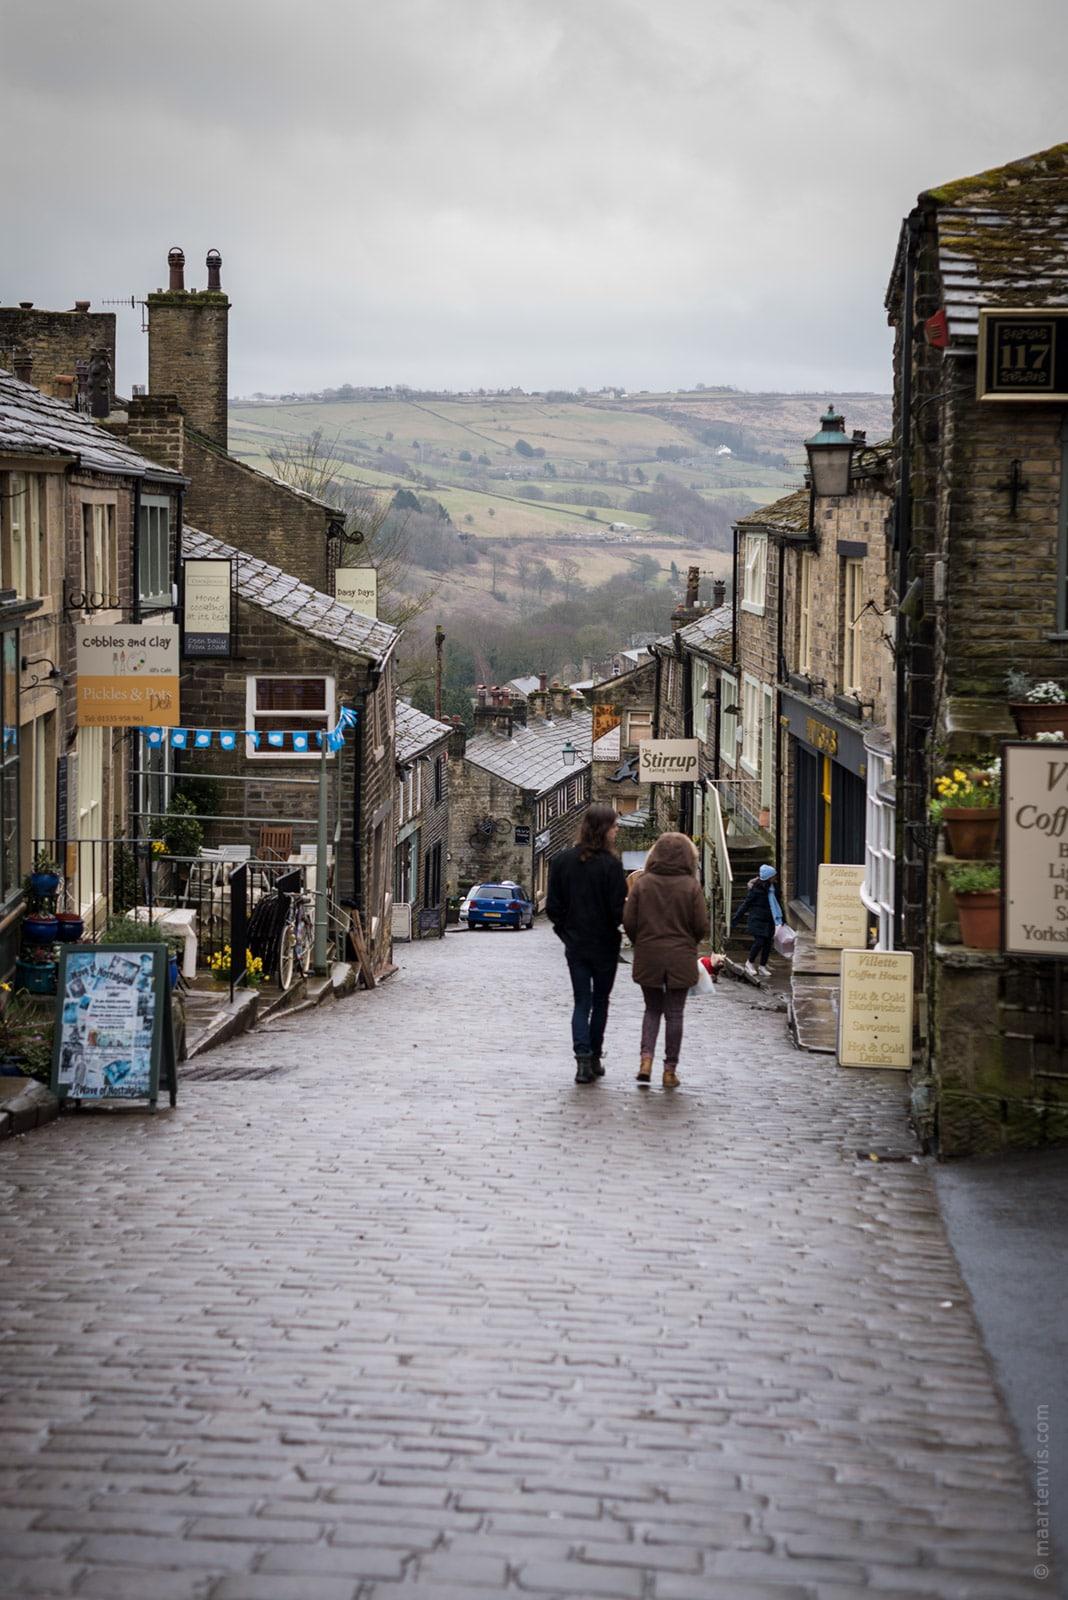 20160324 8050 - Visiting Haworth Yorkshire